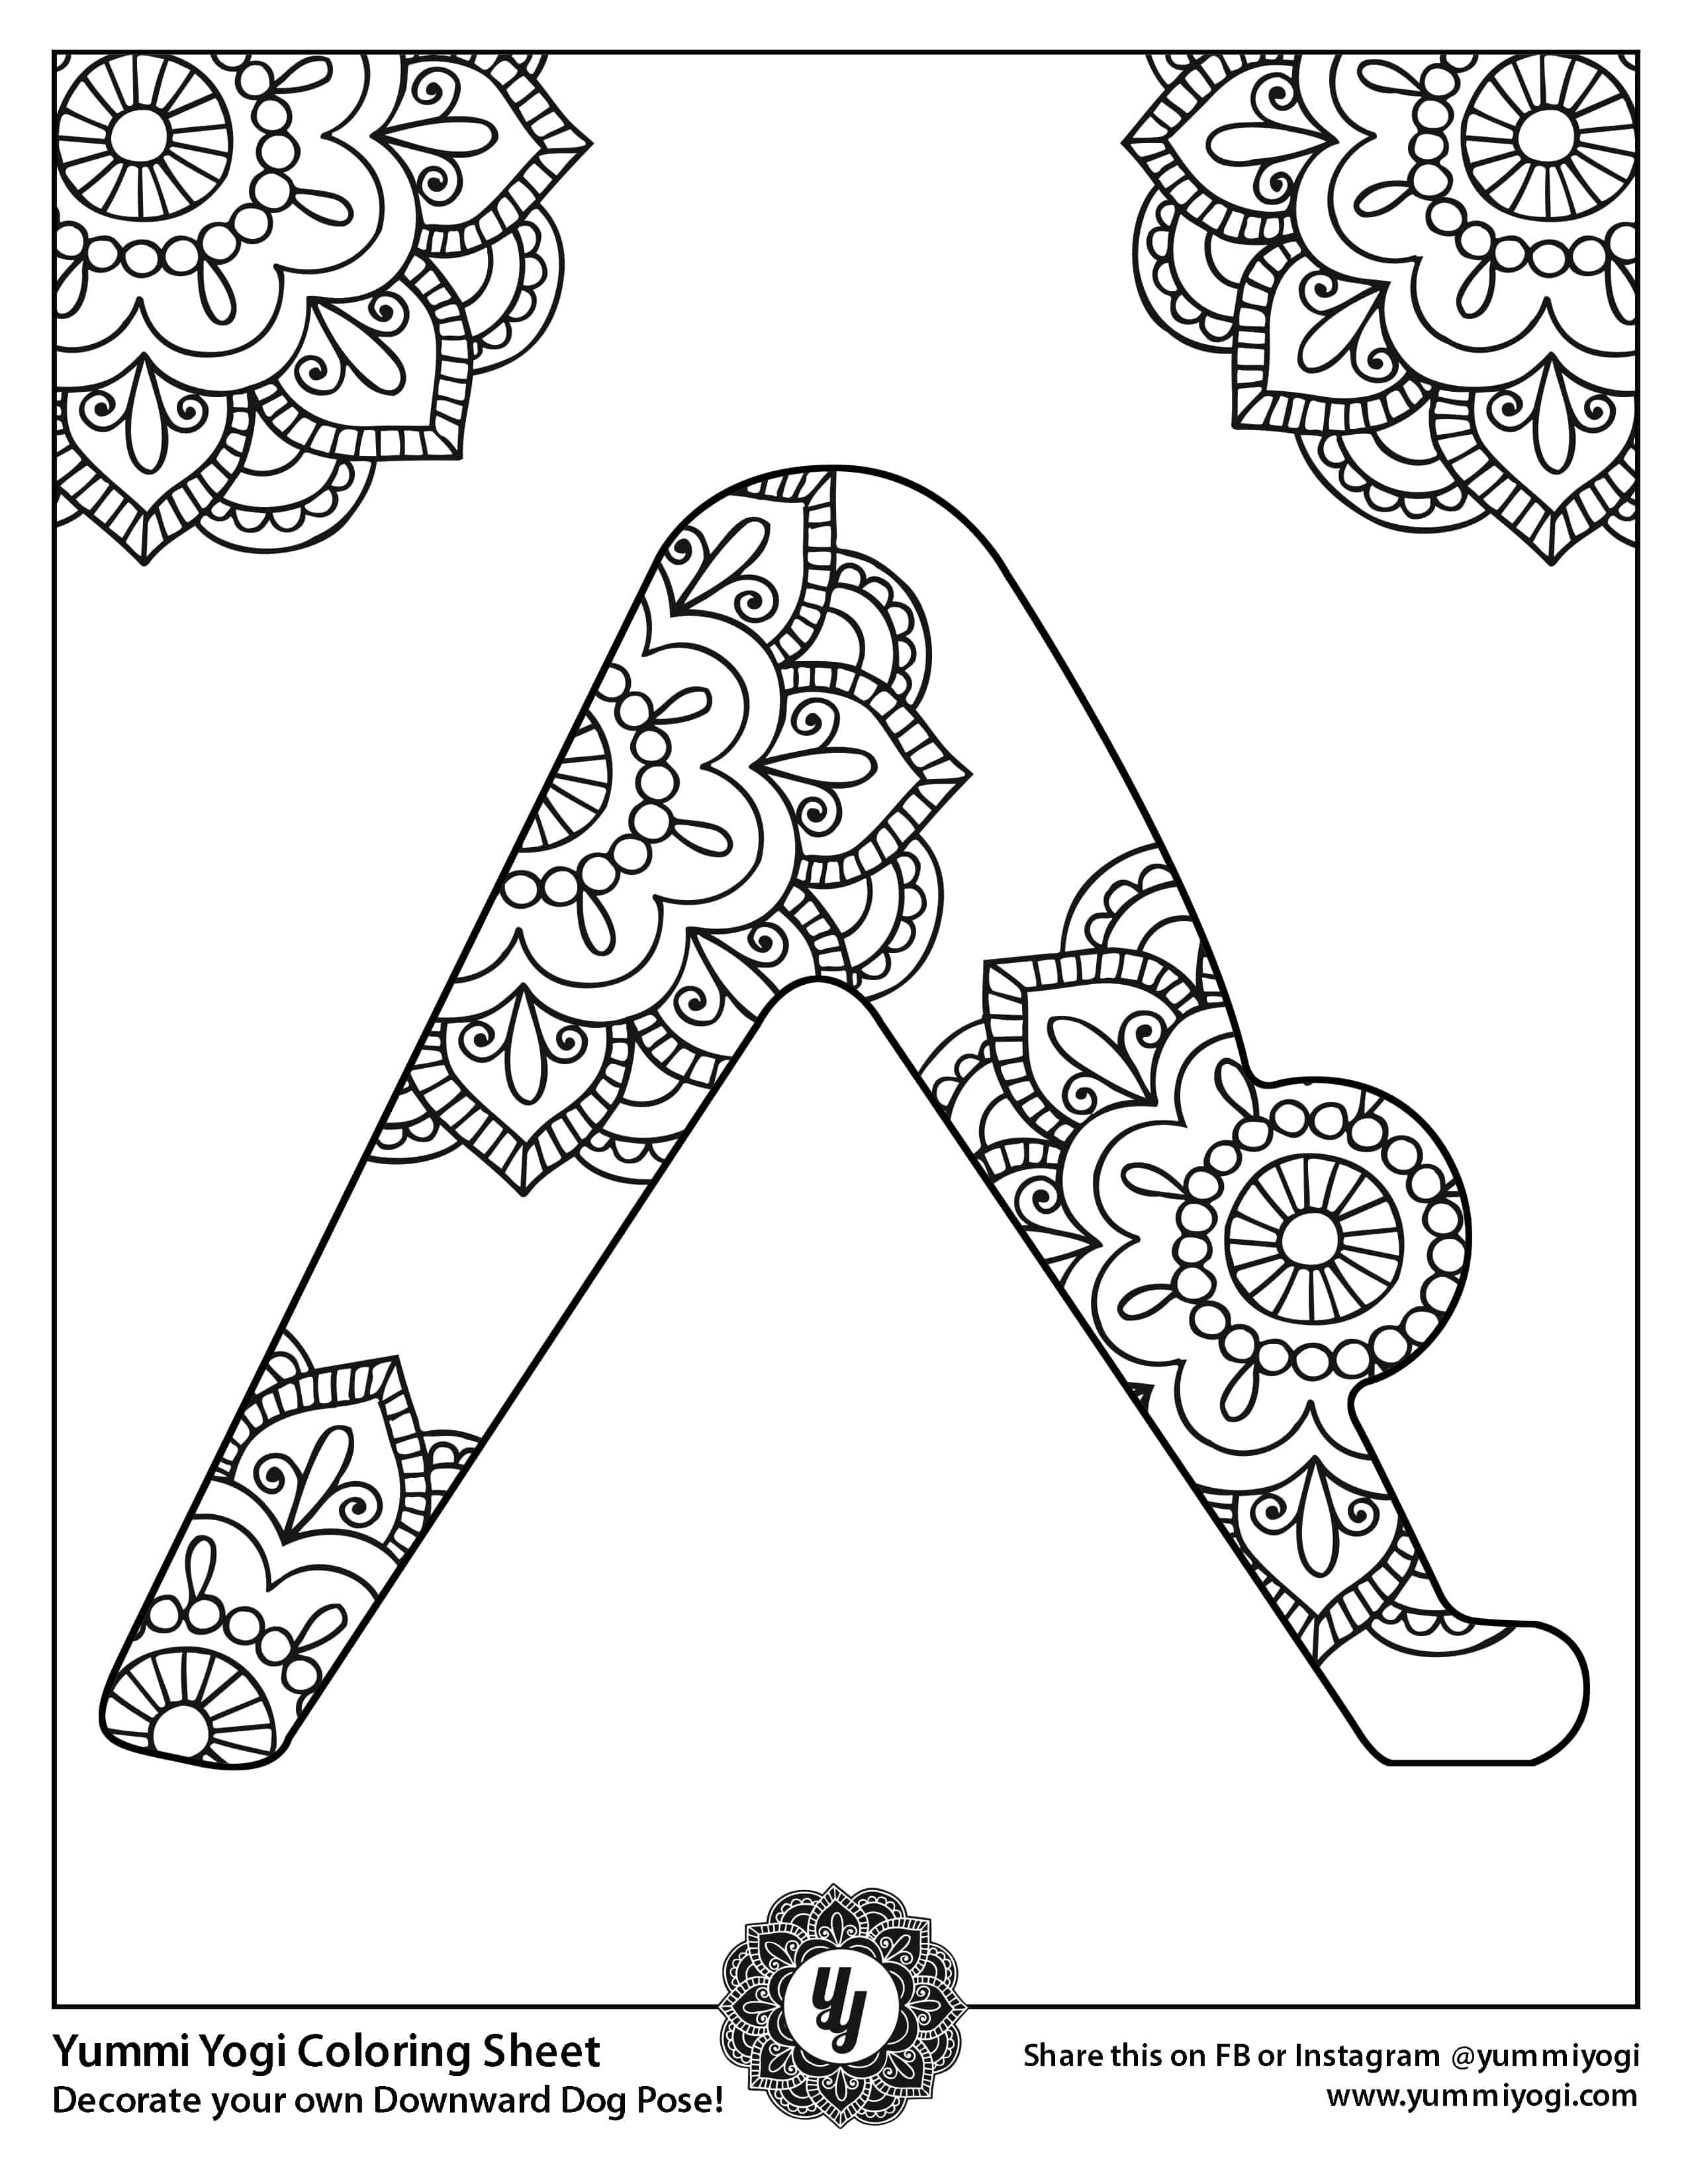 FREE Printable YOGA Coloring Page - Yummi Yogi